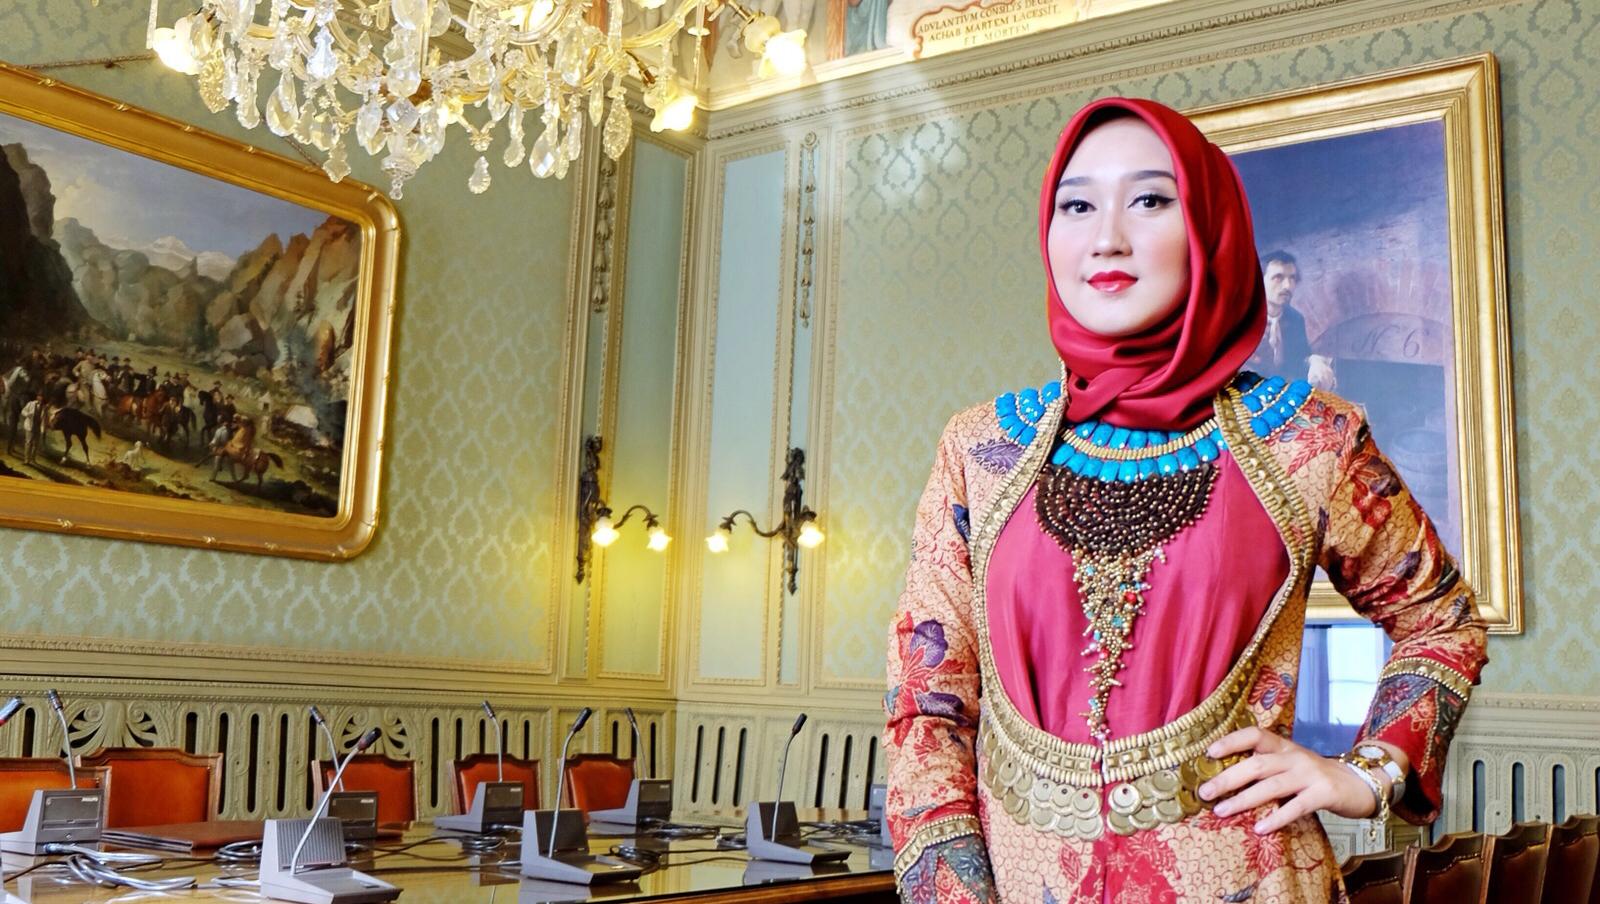 3gpking jilbab jilbab 3 lapis jilbab 3 in 1 jilbab 3 tumpuk episode 3 jilbab in love 4 jilbab yang tidak boleh dipakai  5 hikmah memakai jilbab